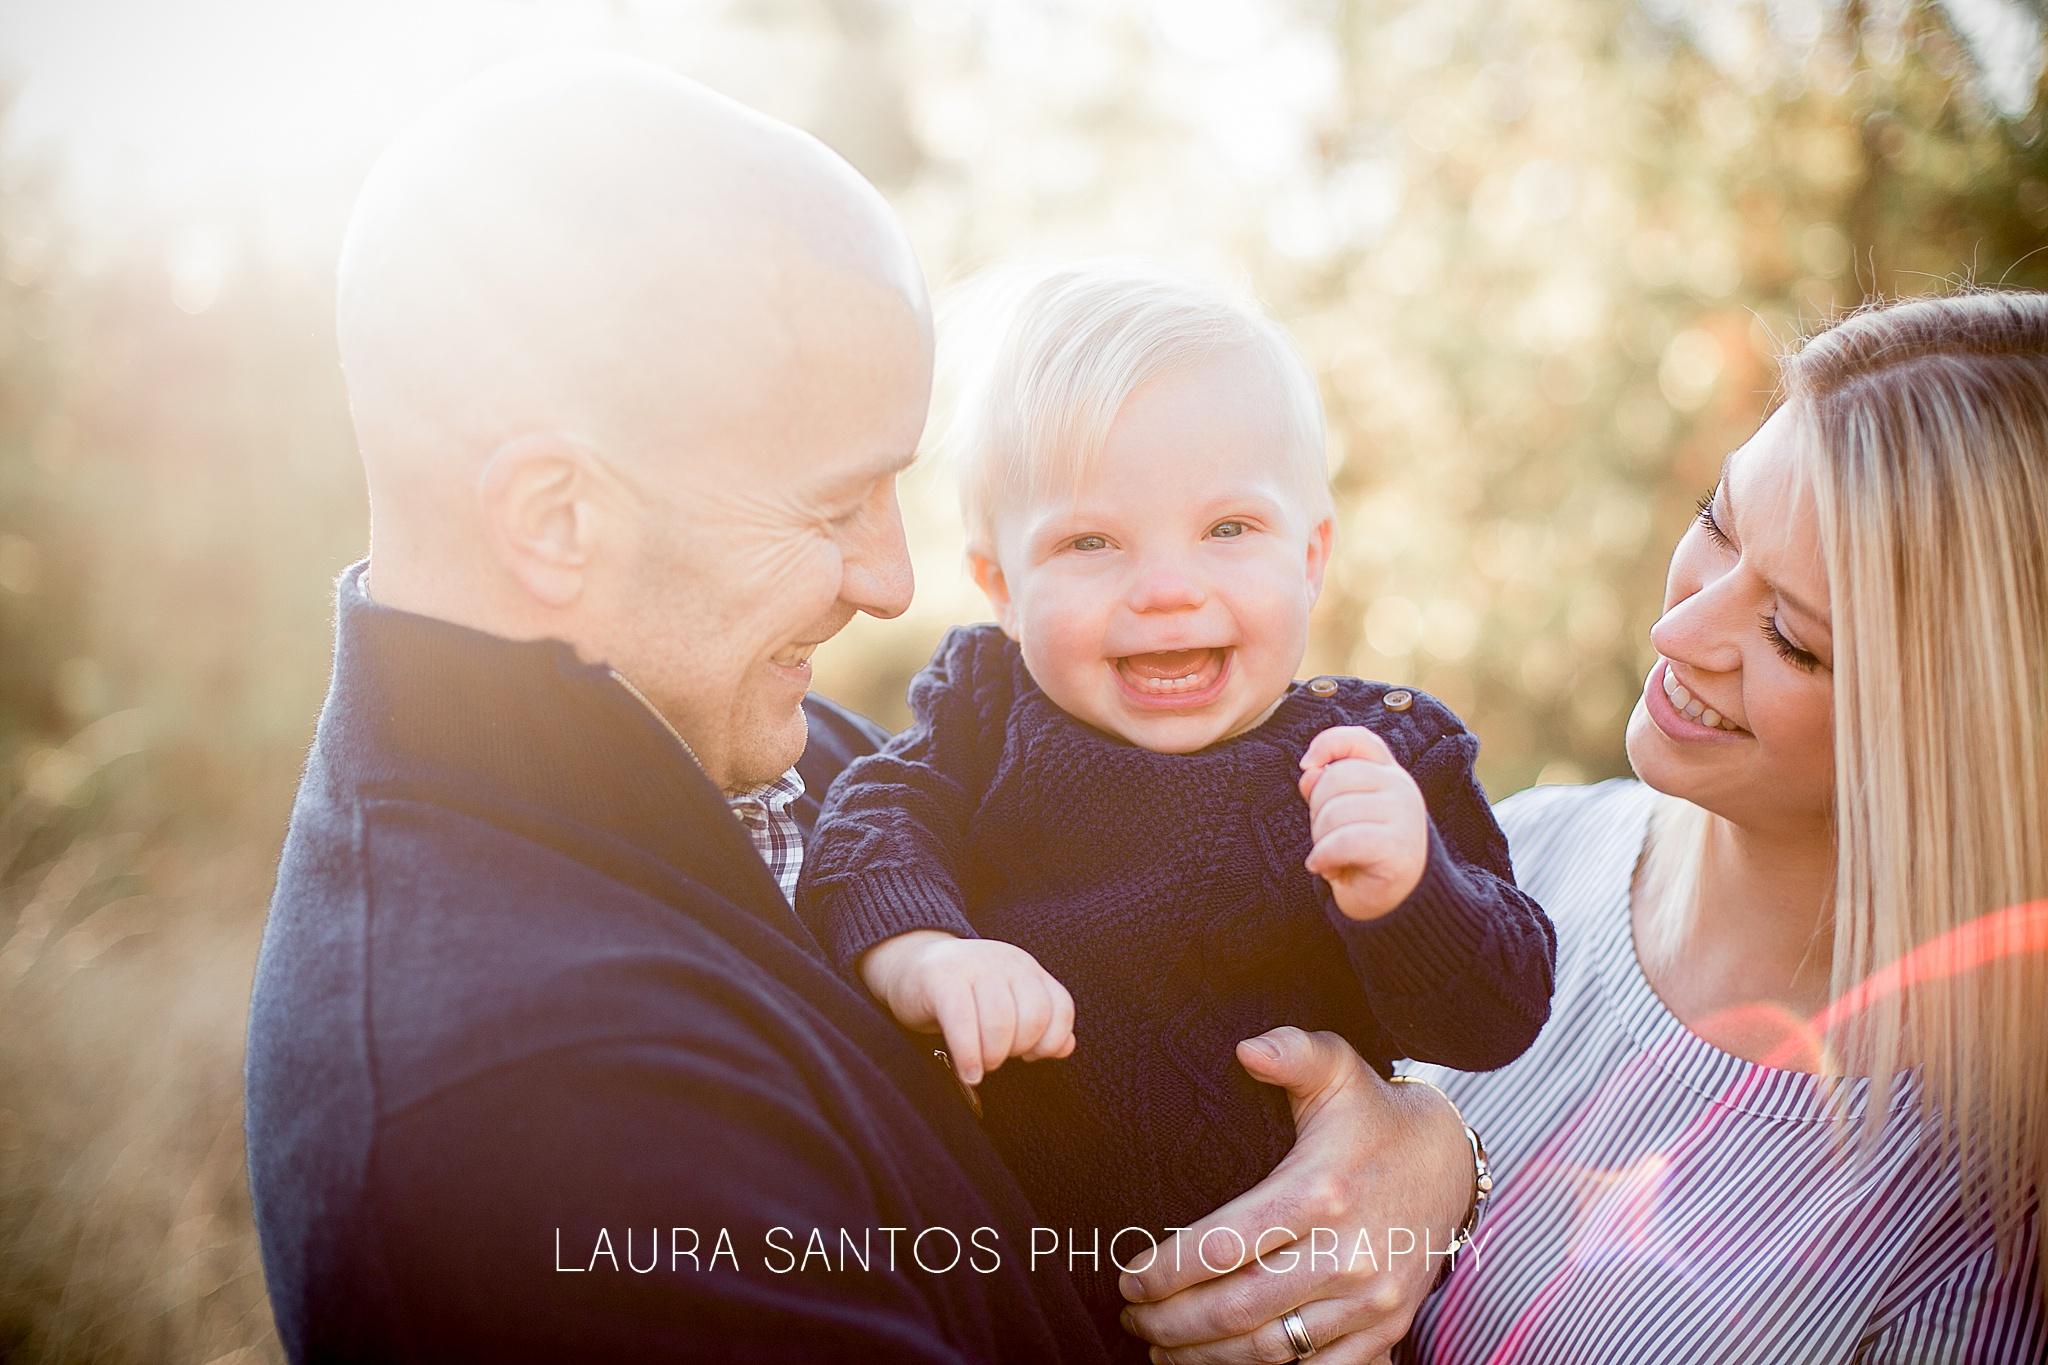 Laura Santos Photography Portland Oregon Family Photographer_0606.jpg